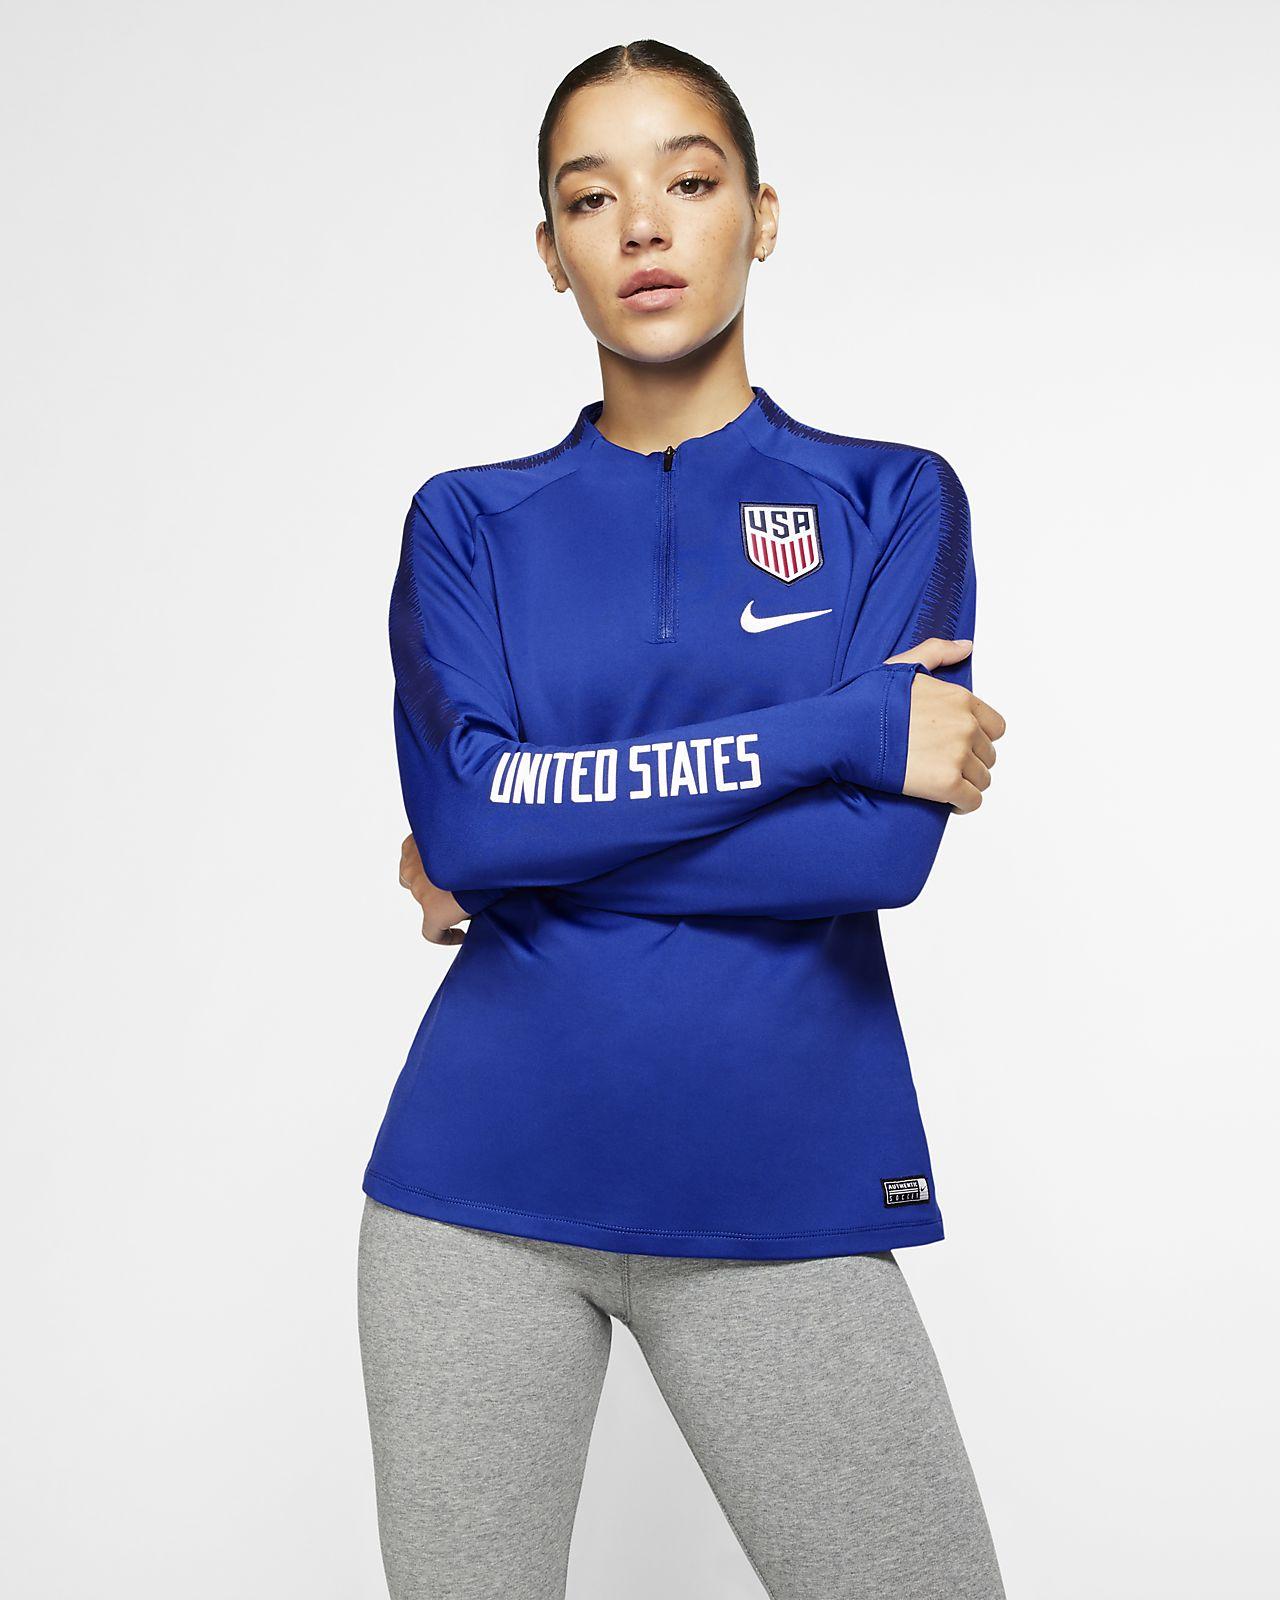 61f176c557e Nike Dri-FIT U.S. Squad Women's Soccer Drill Top. Nike.com